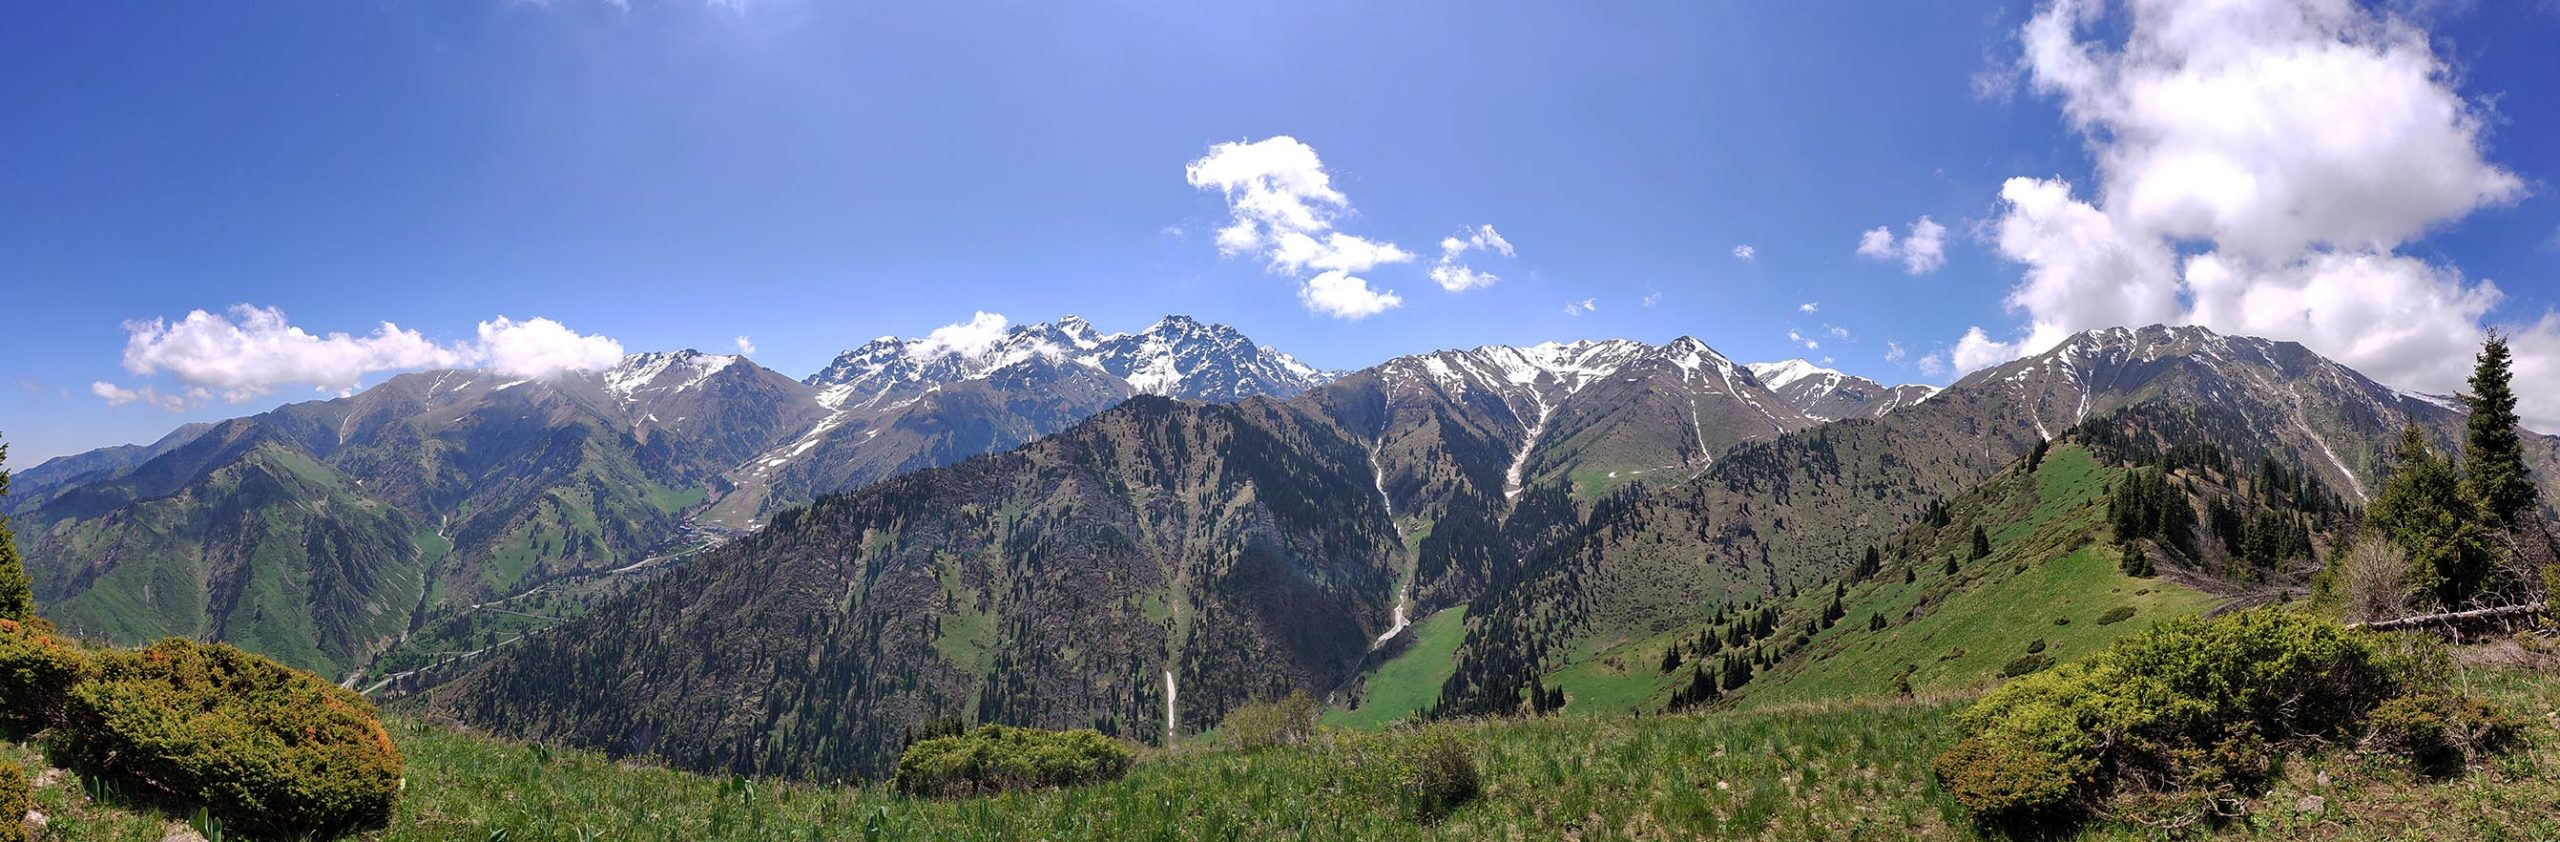 Панорама с горы Горелка